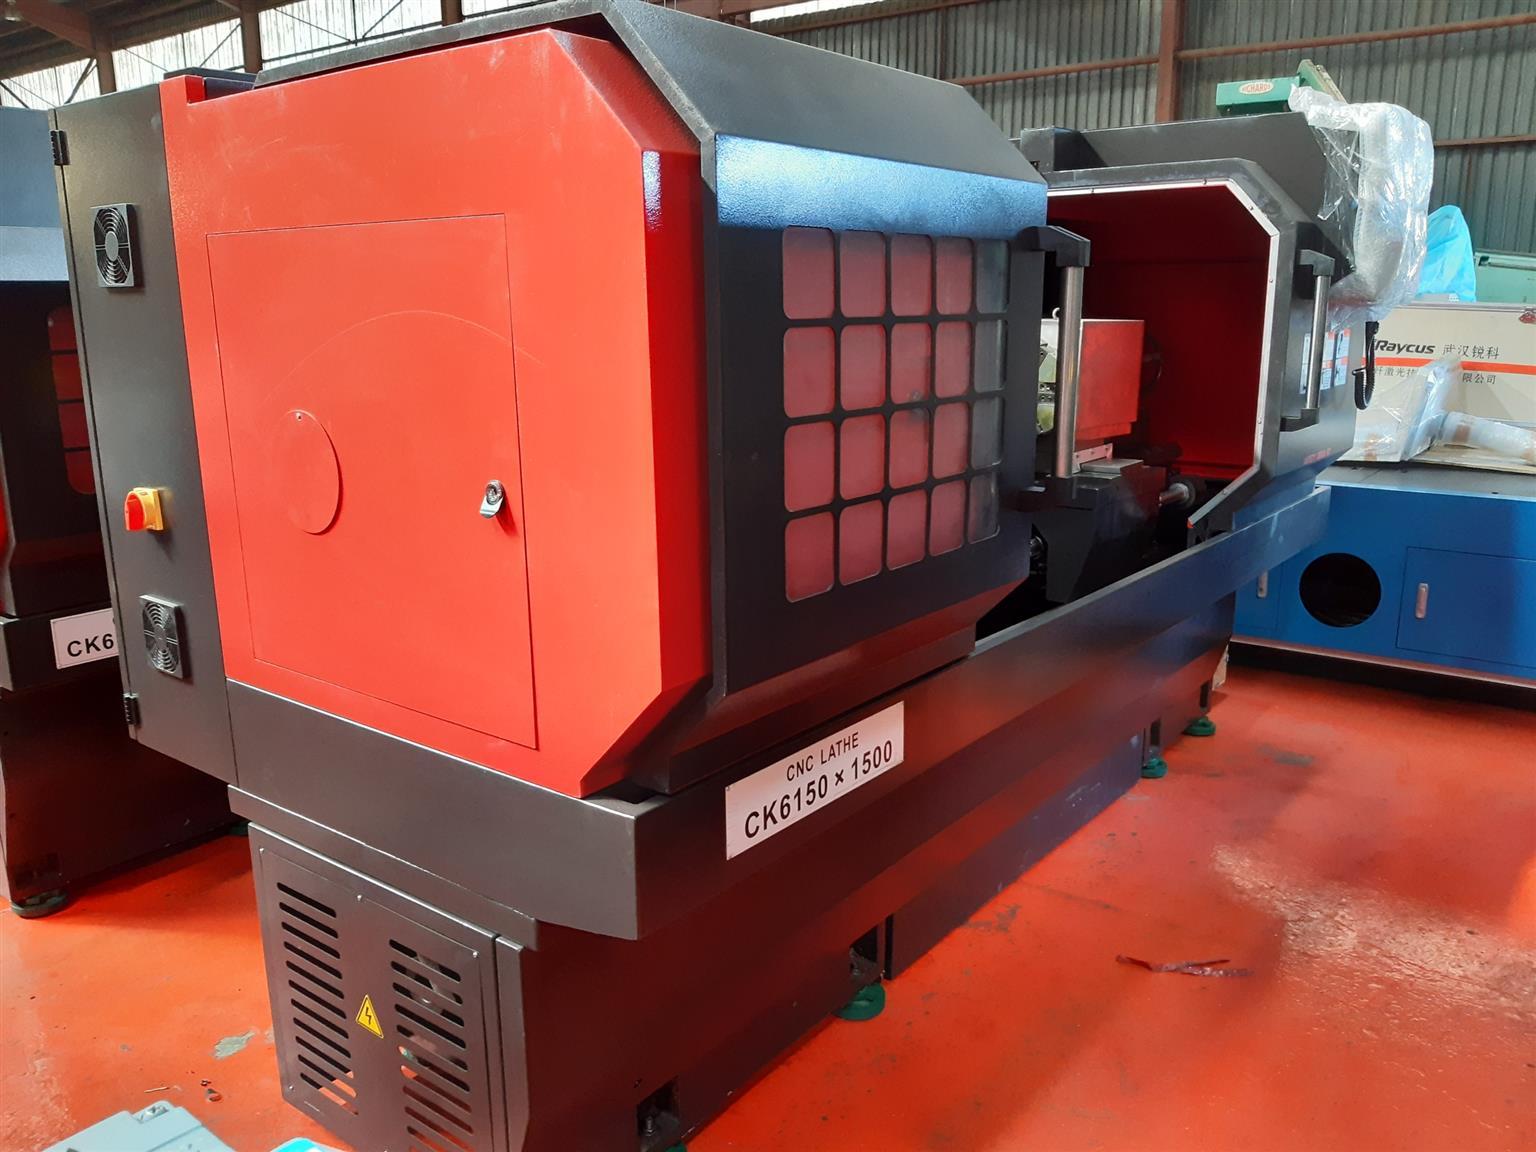 NEW CNC LATHE CK6150x1500